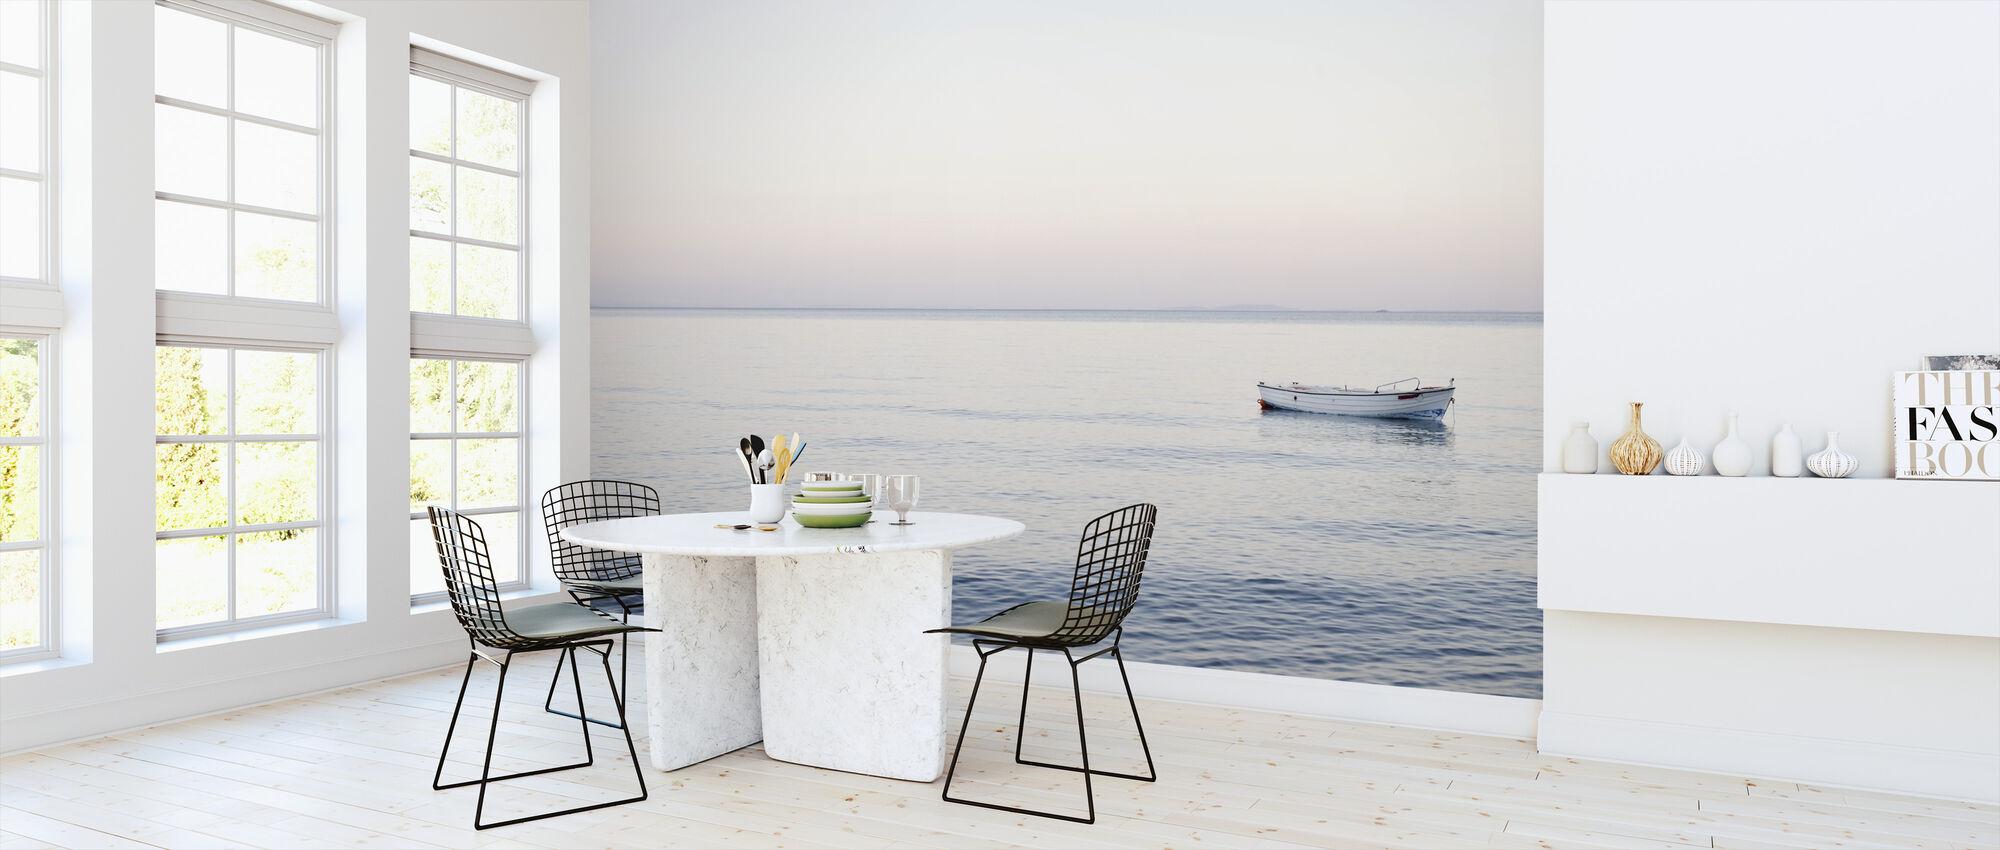 Boat and Sea - Wallpaper - Kitchen